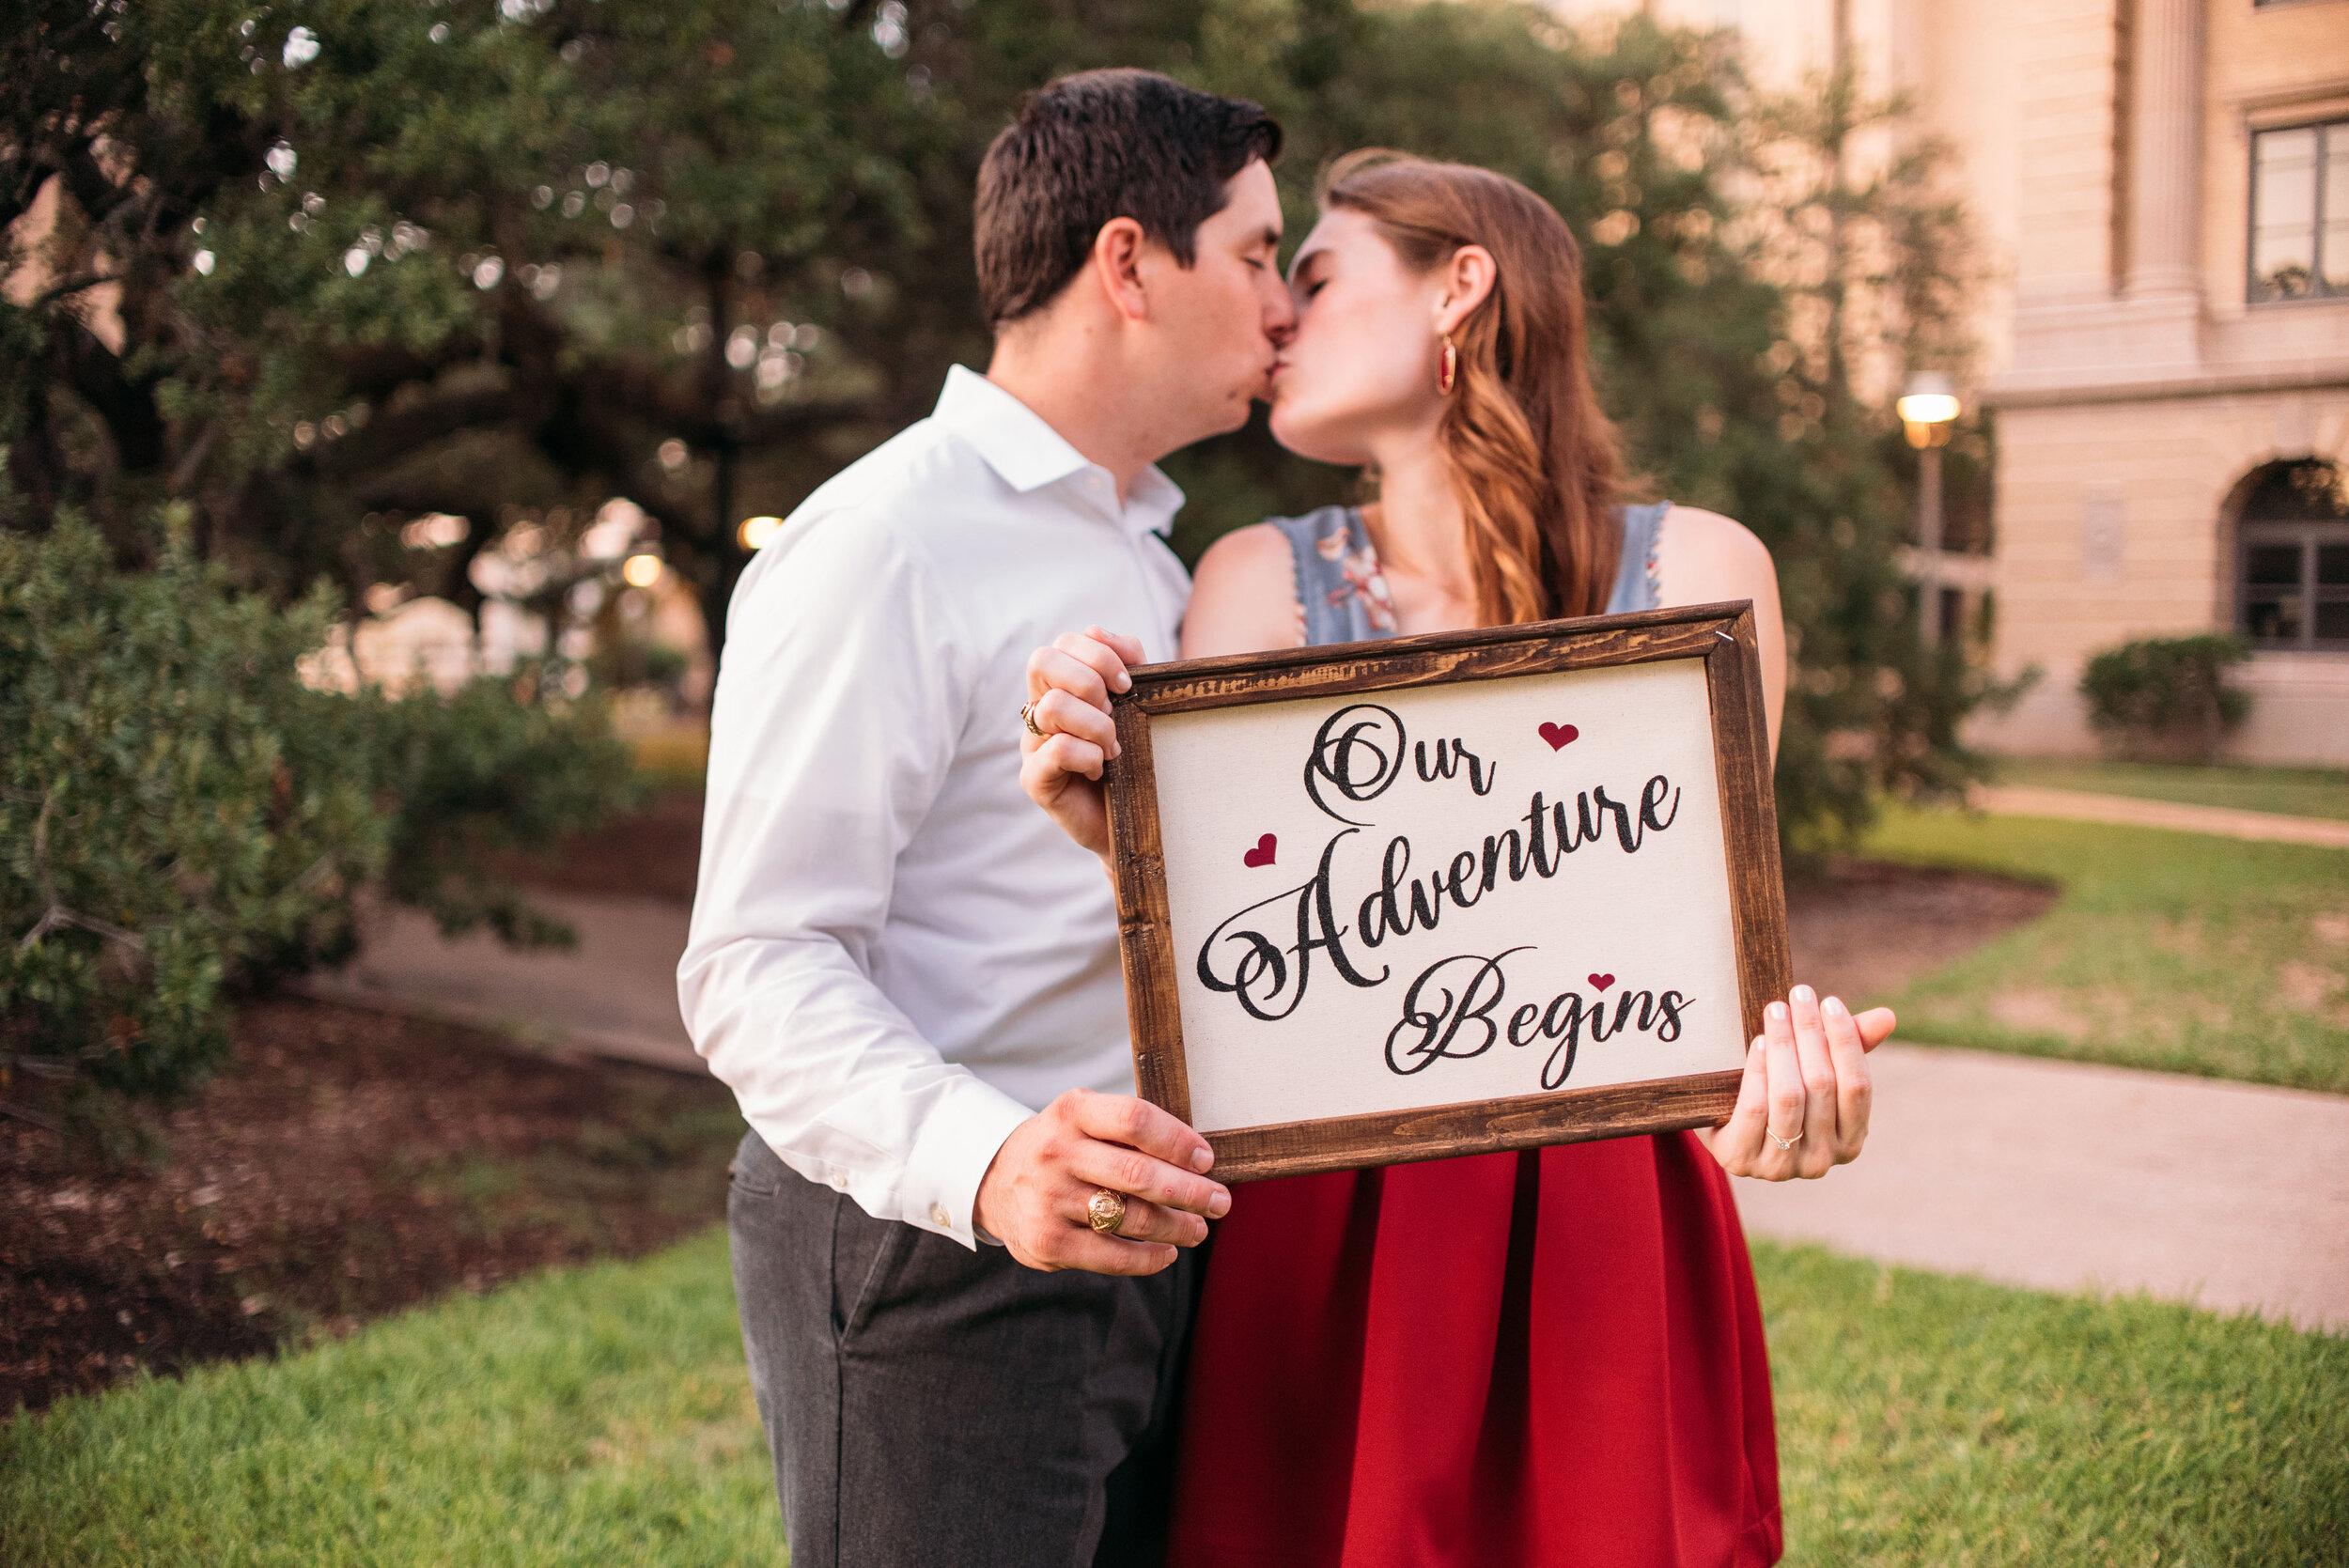 Texas-A&M-University-Engagement-Session-Century-Tree-Military-Walk-College-Station-Wedding-Photographer-San-Angel-Photo-Tony-Kate-31.jpg